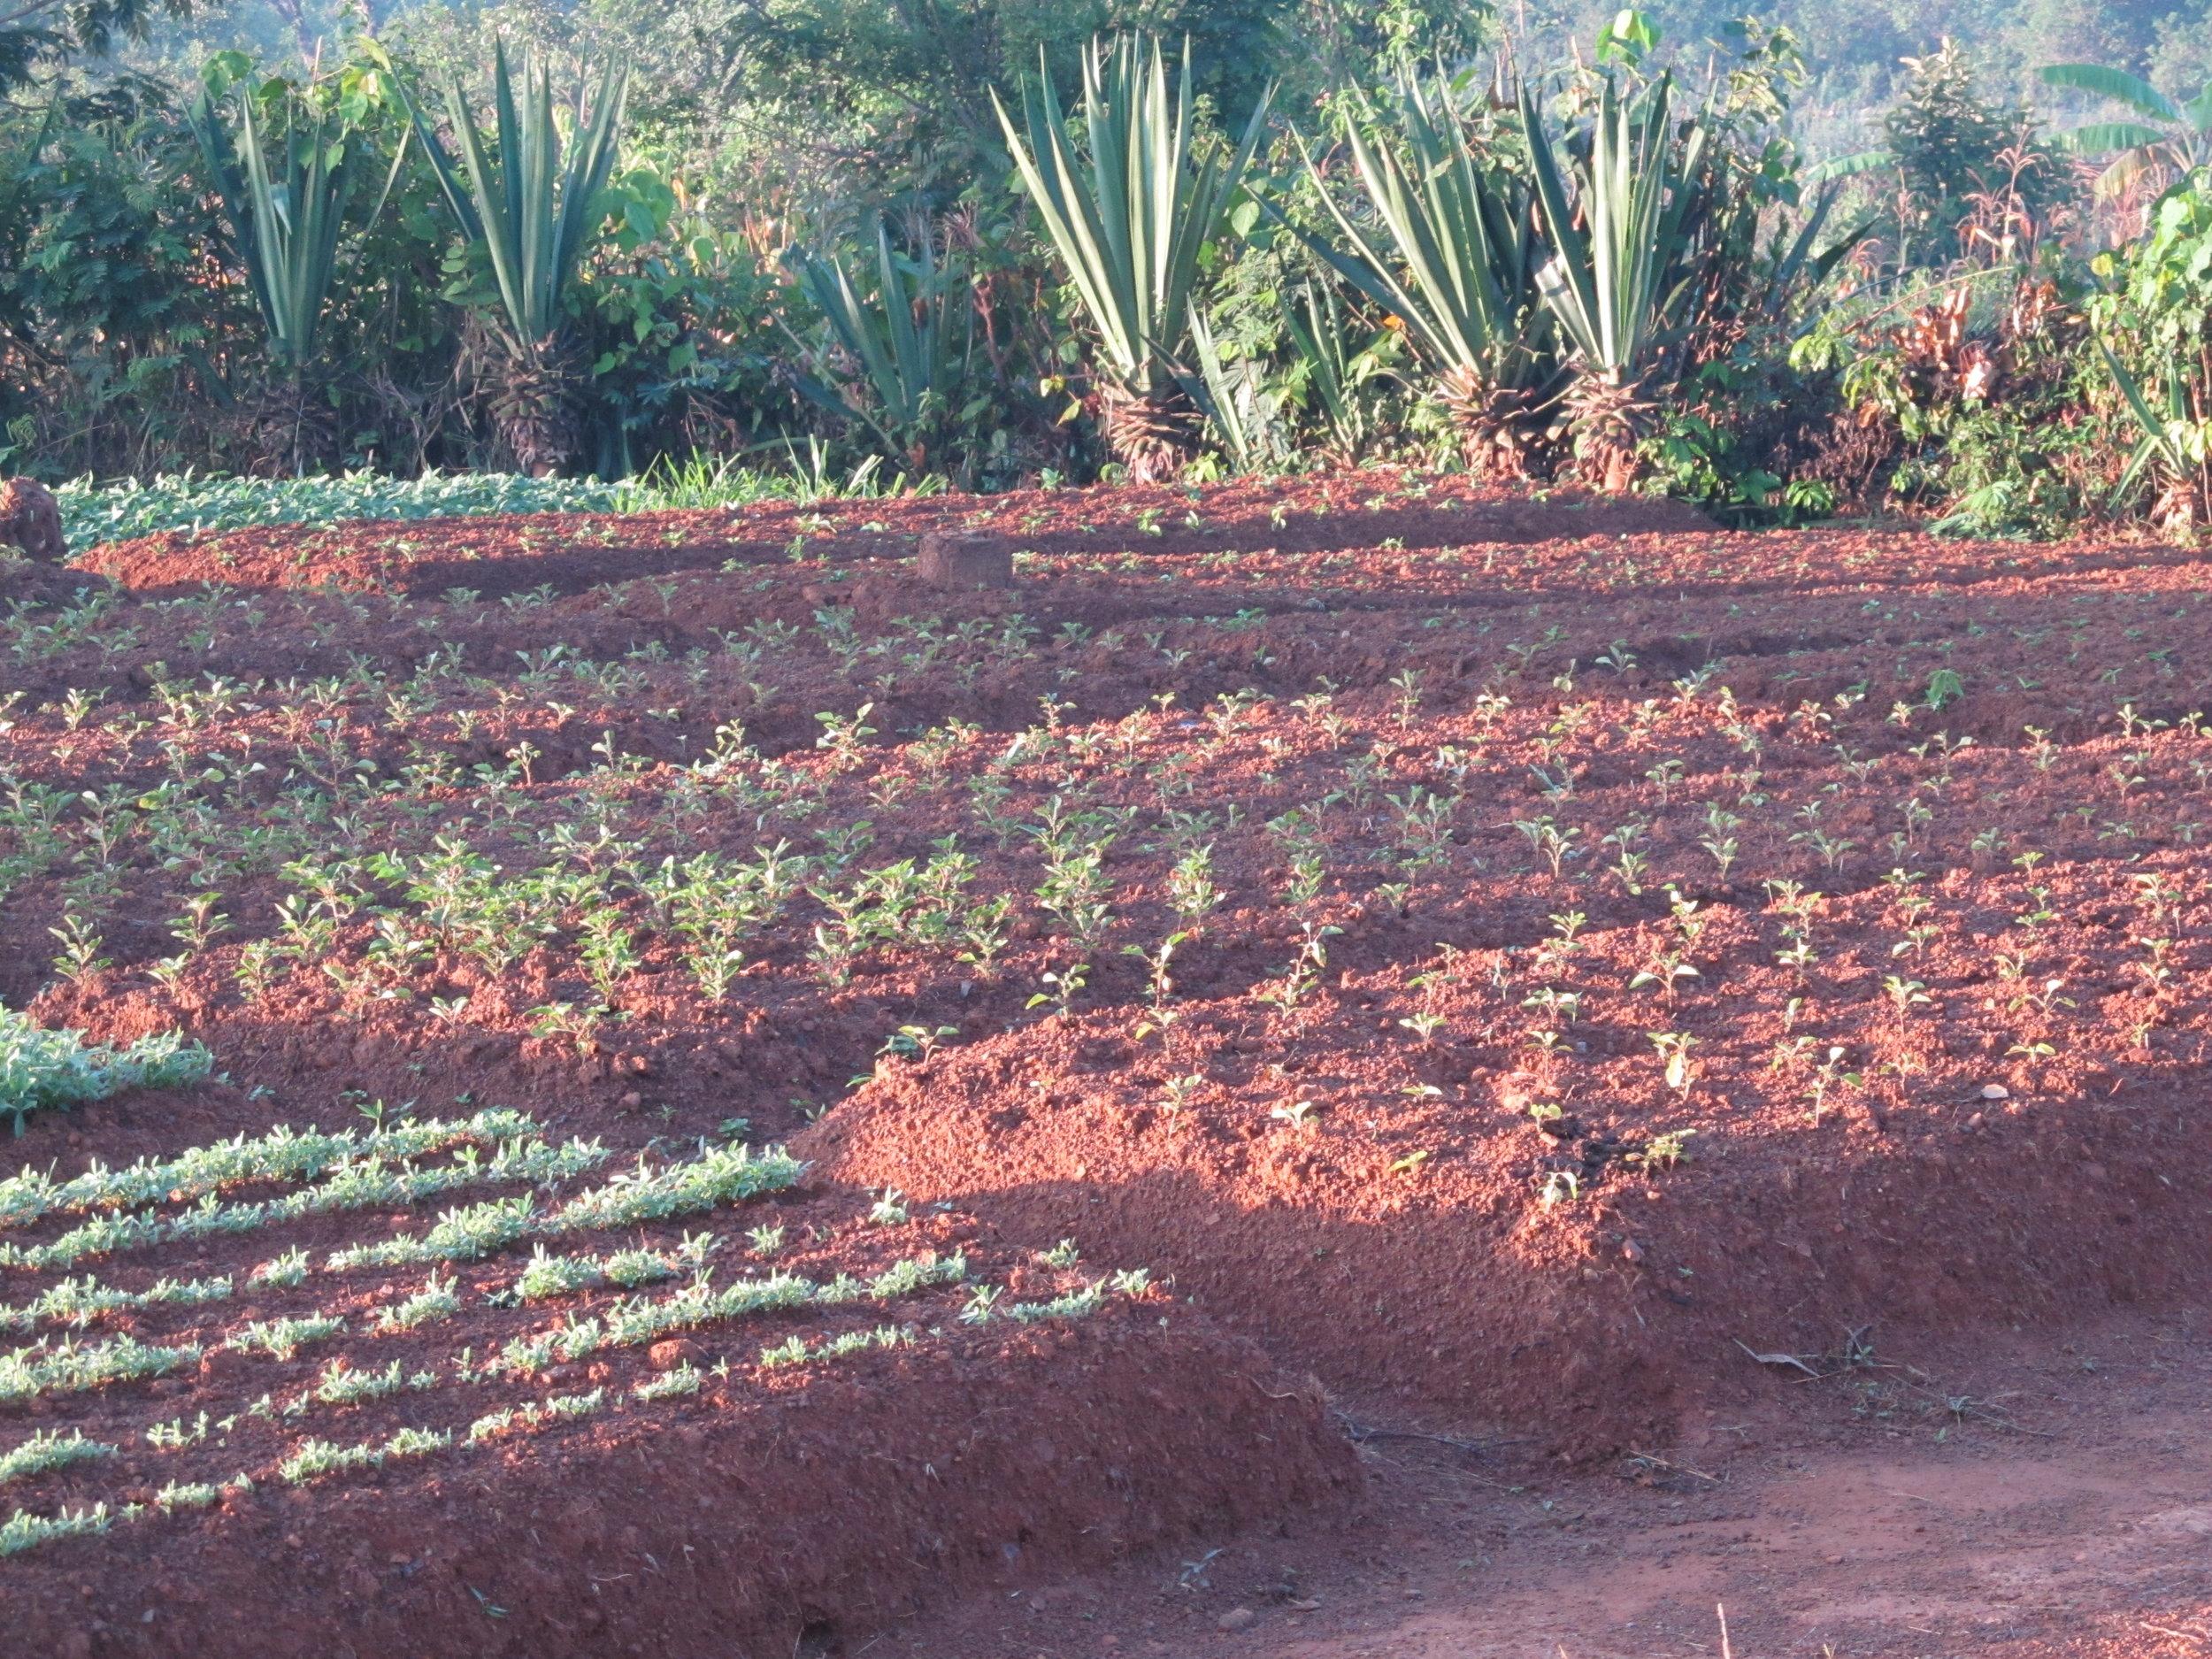 Varied raised bed farming